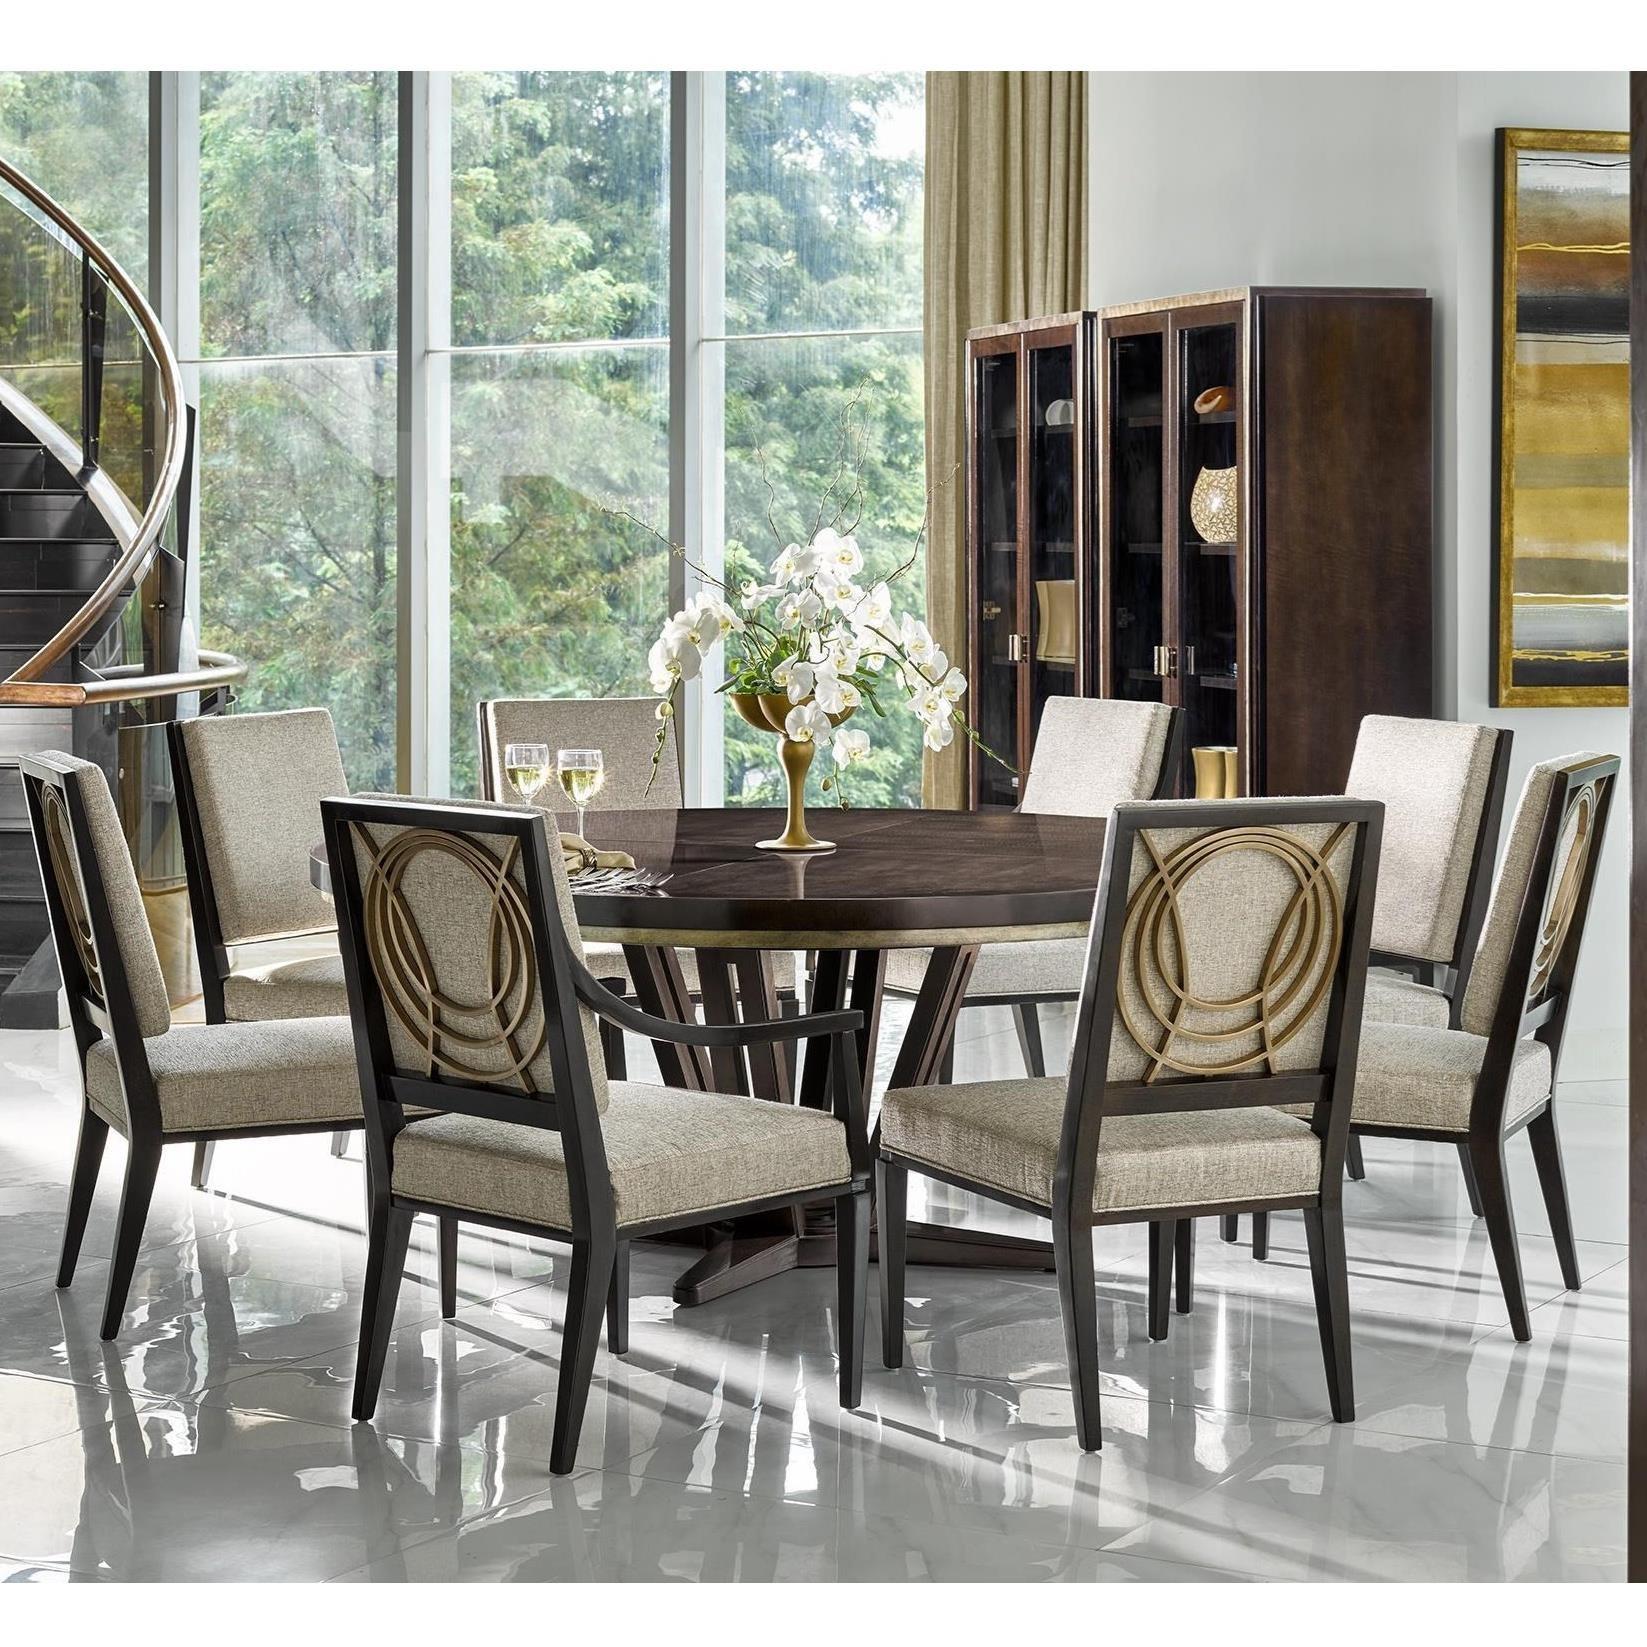 fine furniture design deco 9 piece dining set with round table baer 39 s furniture dining 7 or. Black Bedroom Furniture Sets. Home Design Ideas